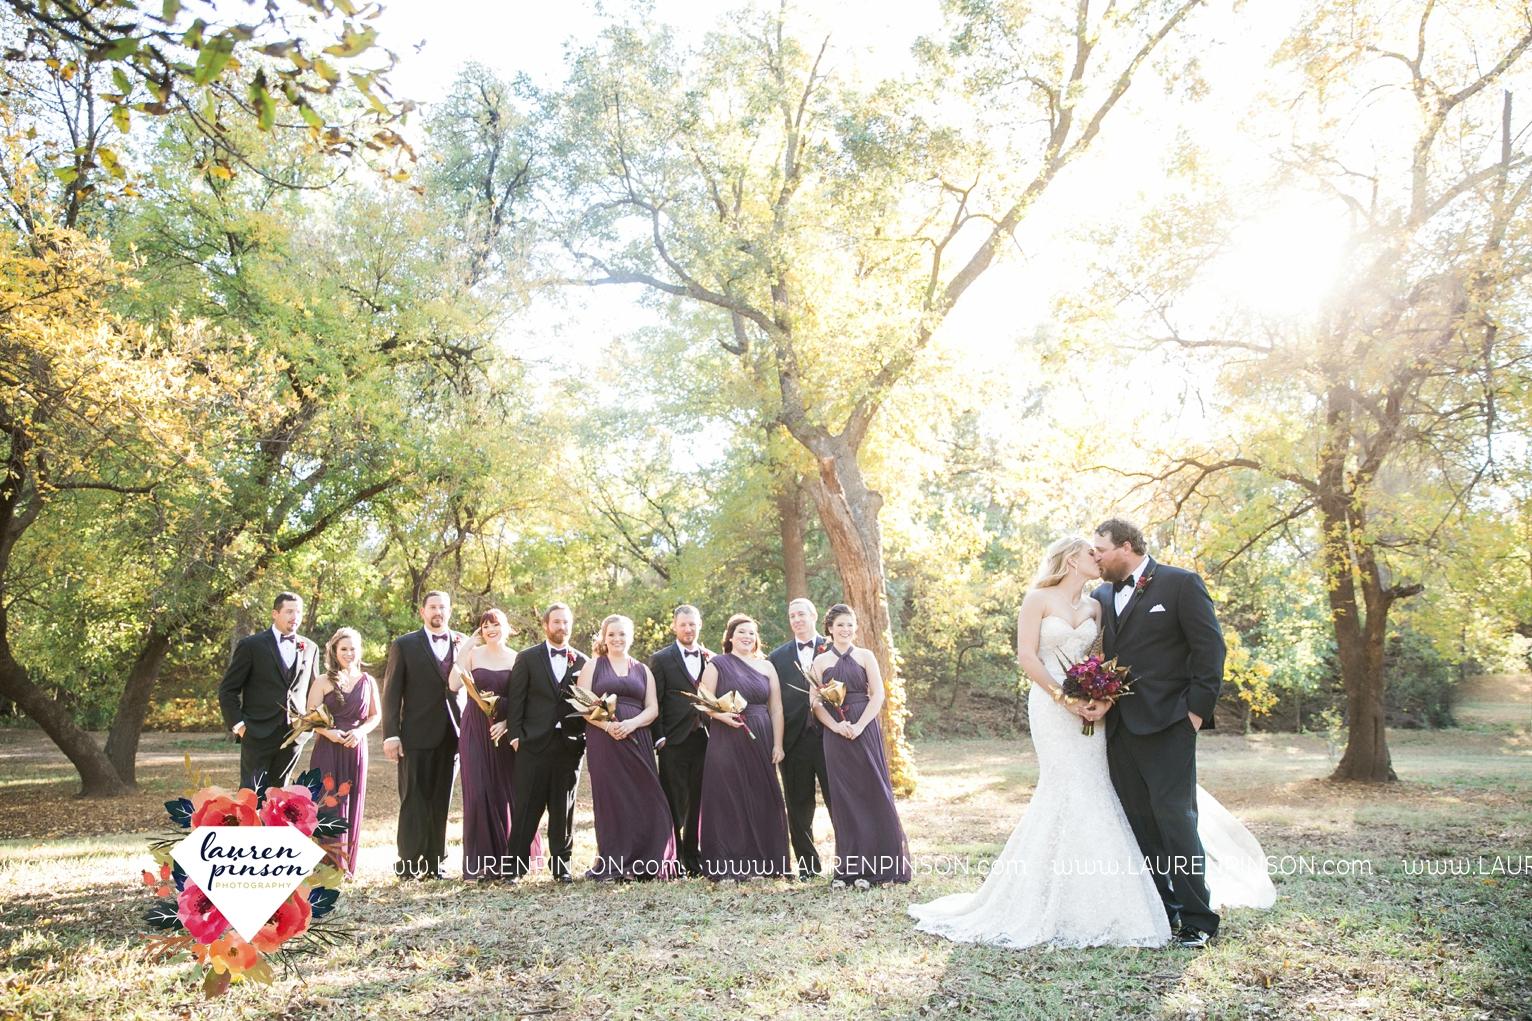 rustic-wichita-falls-texas-wedding-photographer-gold-glam-mayfield-events-market-street-united-allue-bridals-fall_1751.jpg